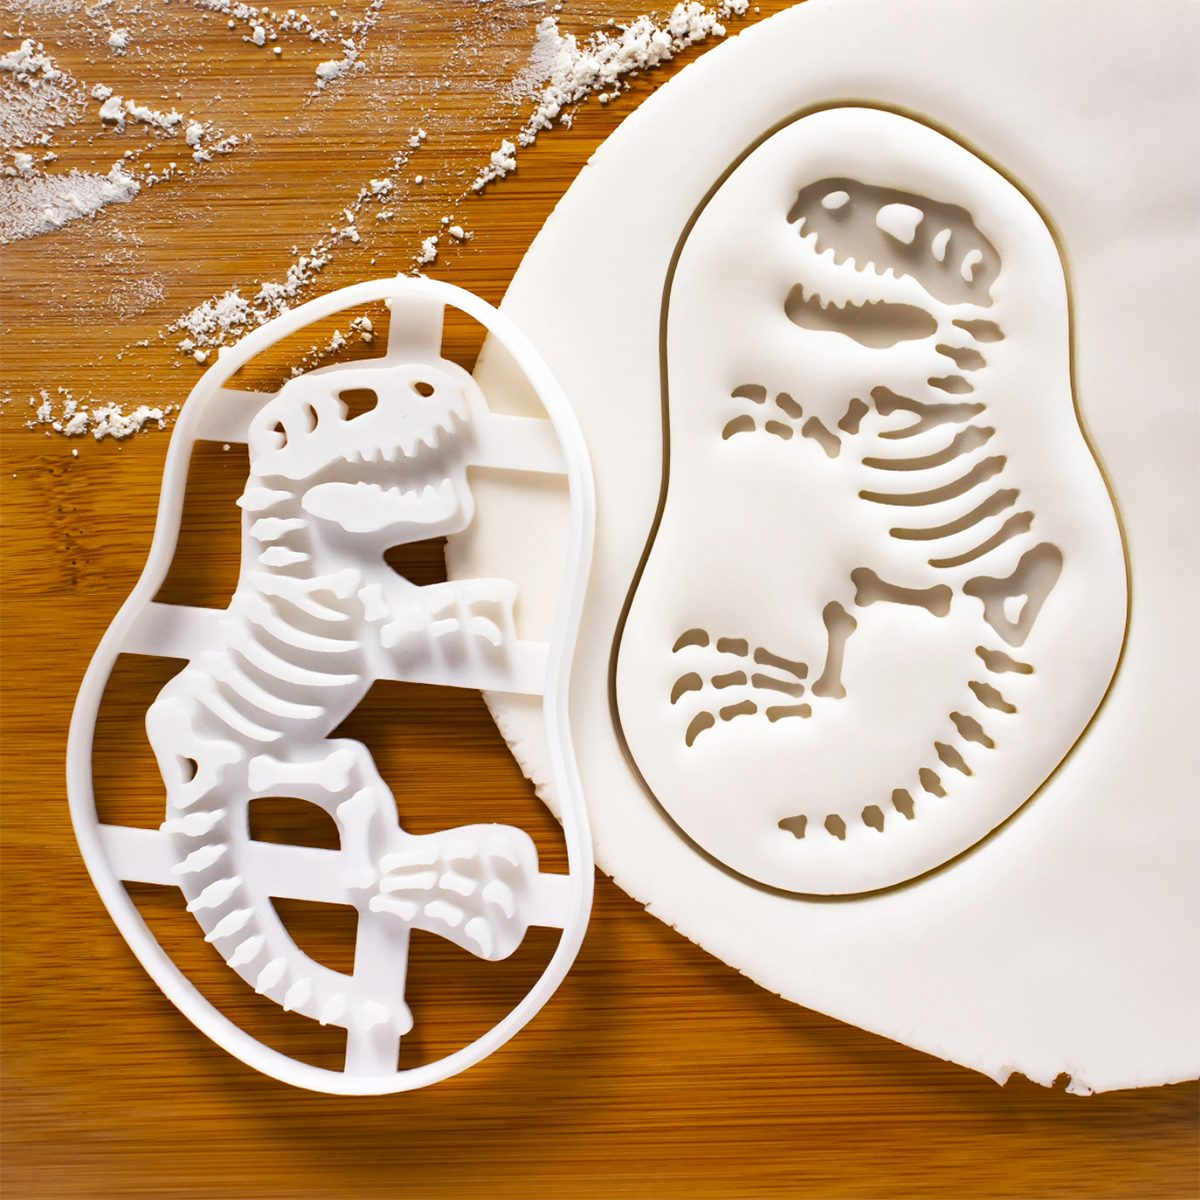 Fossil T-Rex cookie cutter and other dinosaurs | biscuit cutter | Tyrannosaurus rex | creative hunt extinct T Rex dinosaur | ooak |Bakerlogy